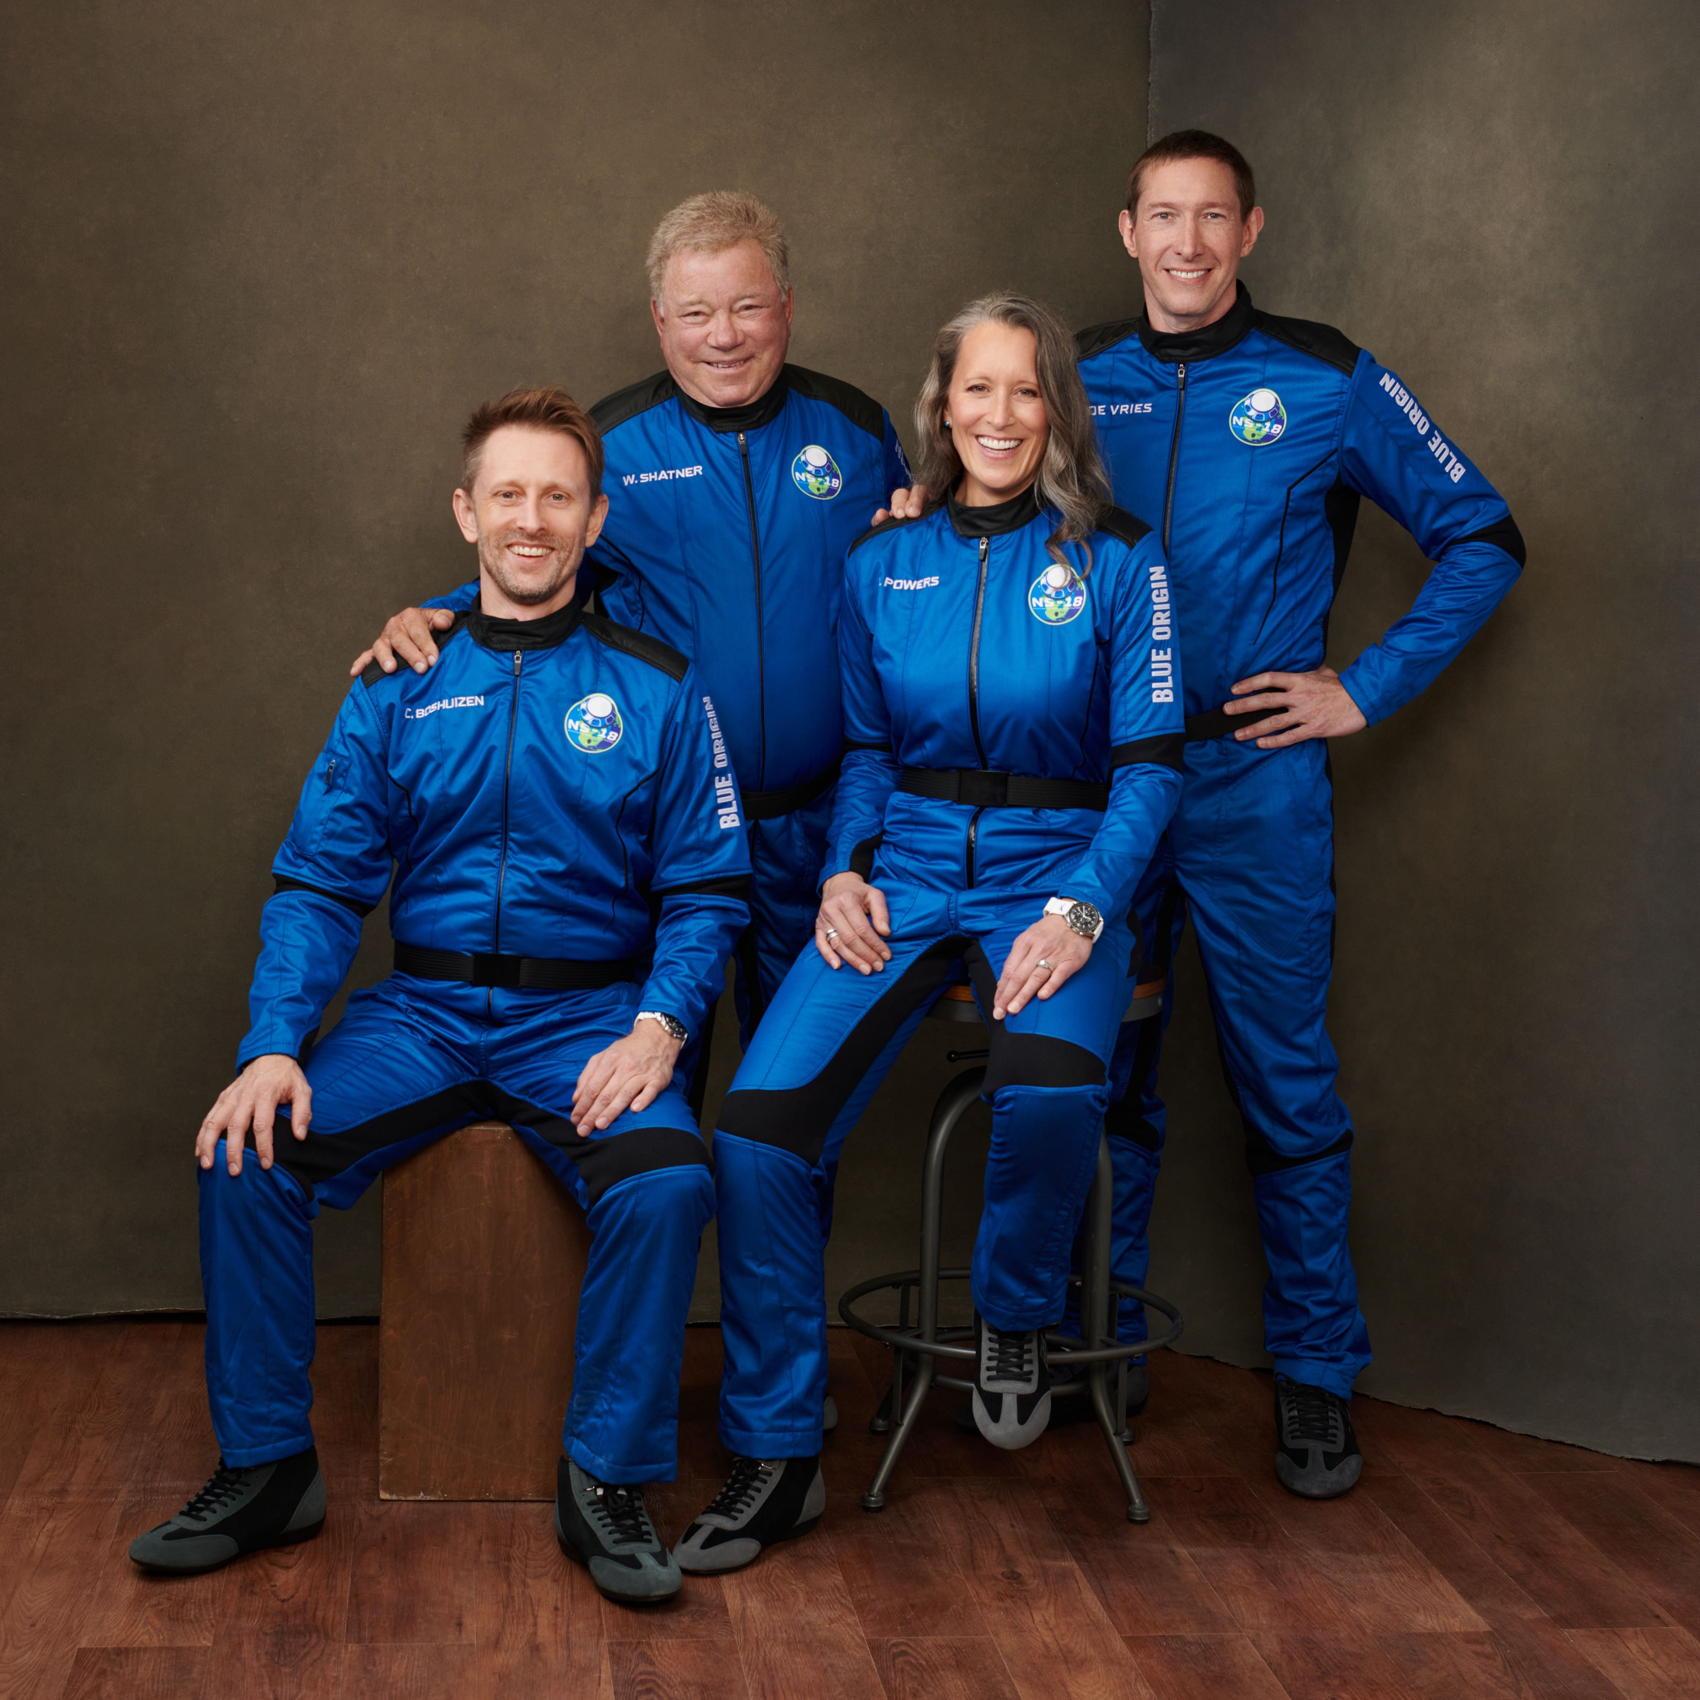 Blue Origin NS-18 Crew - Credit Blue Origin